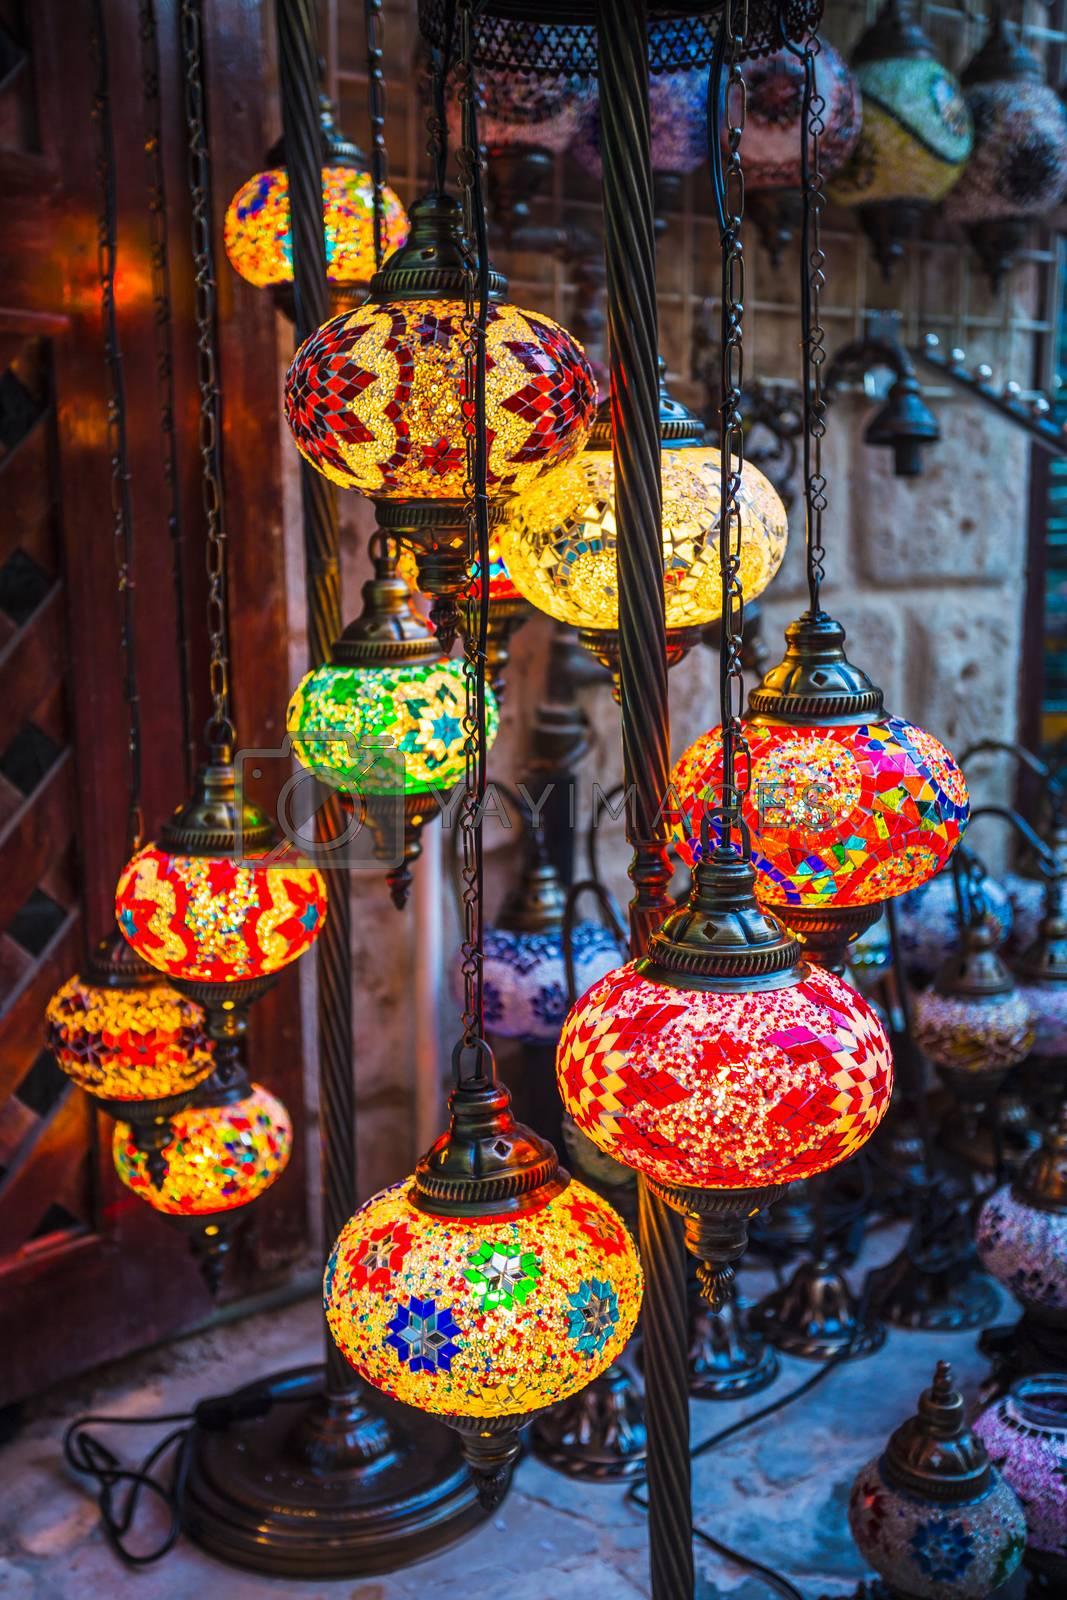 Arab street lanterns in the city of Dubai in the United Arab Emirates